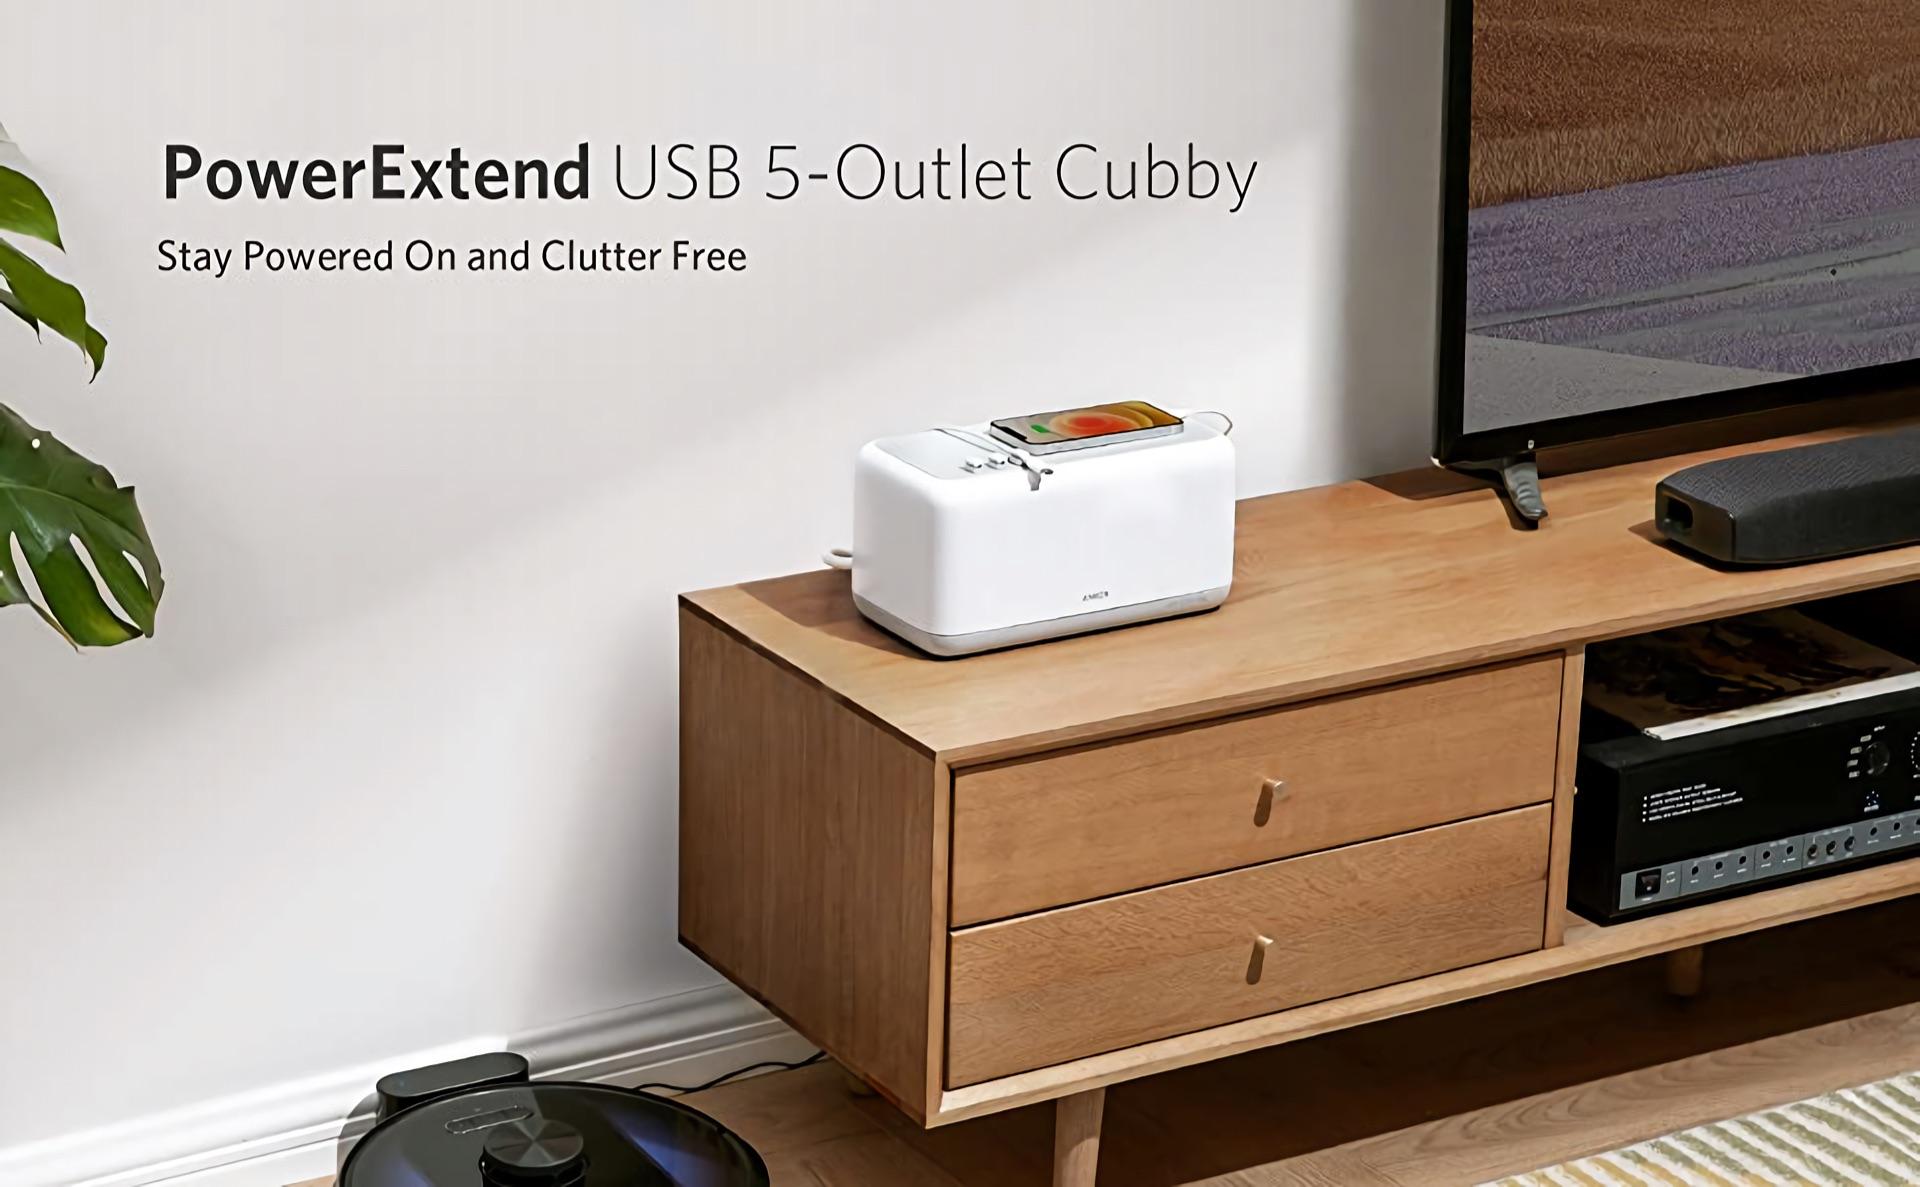 Anker PowerExtend USB 5-Outlet Cubby